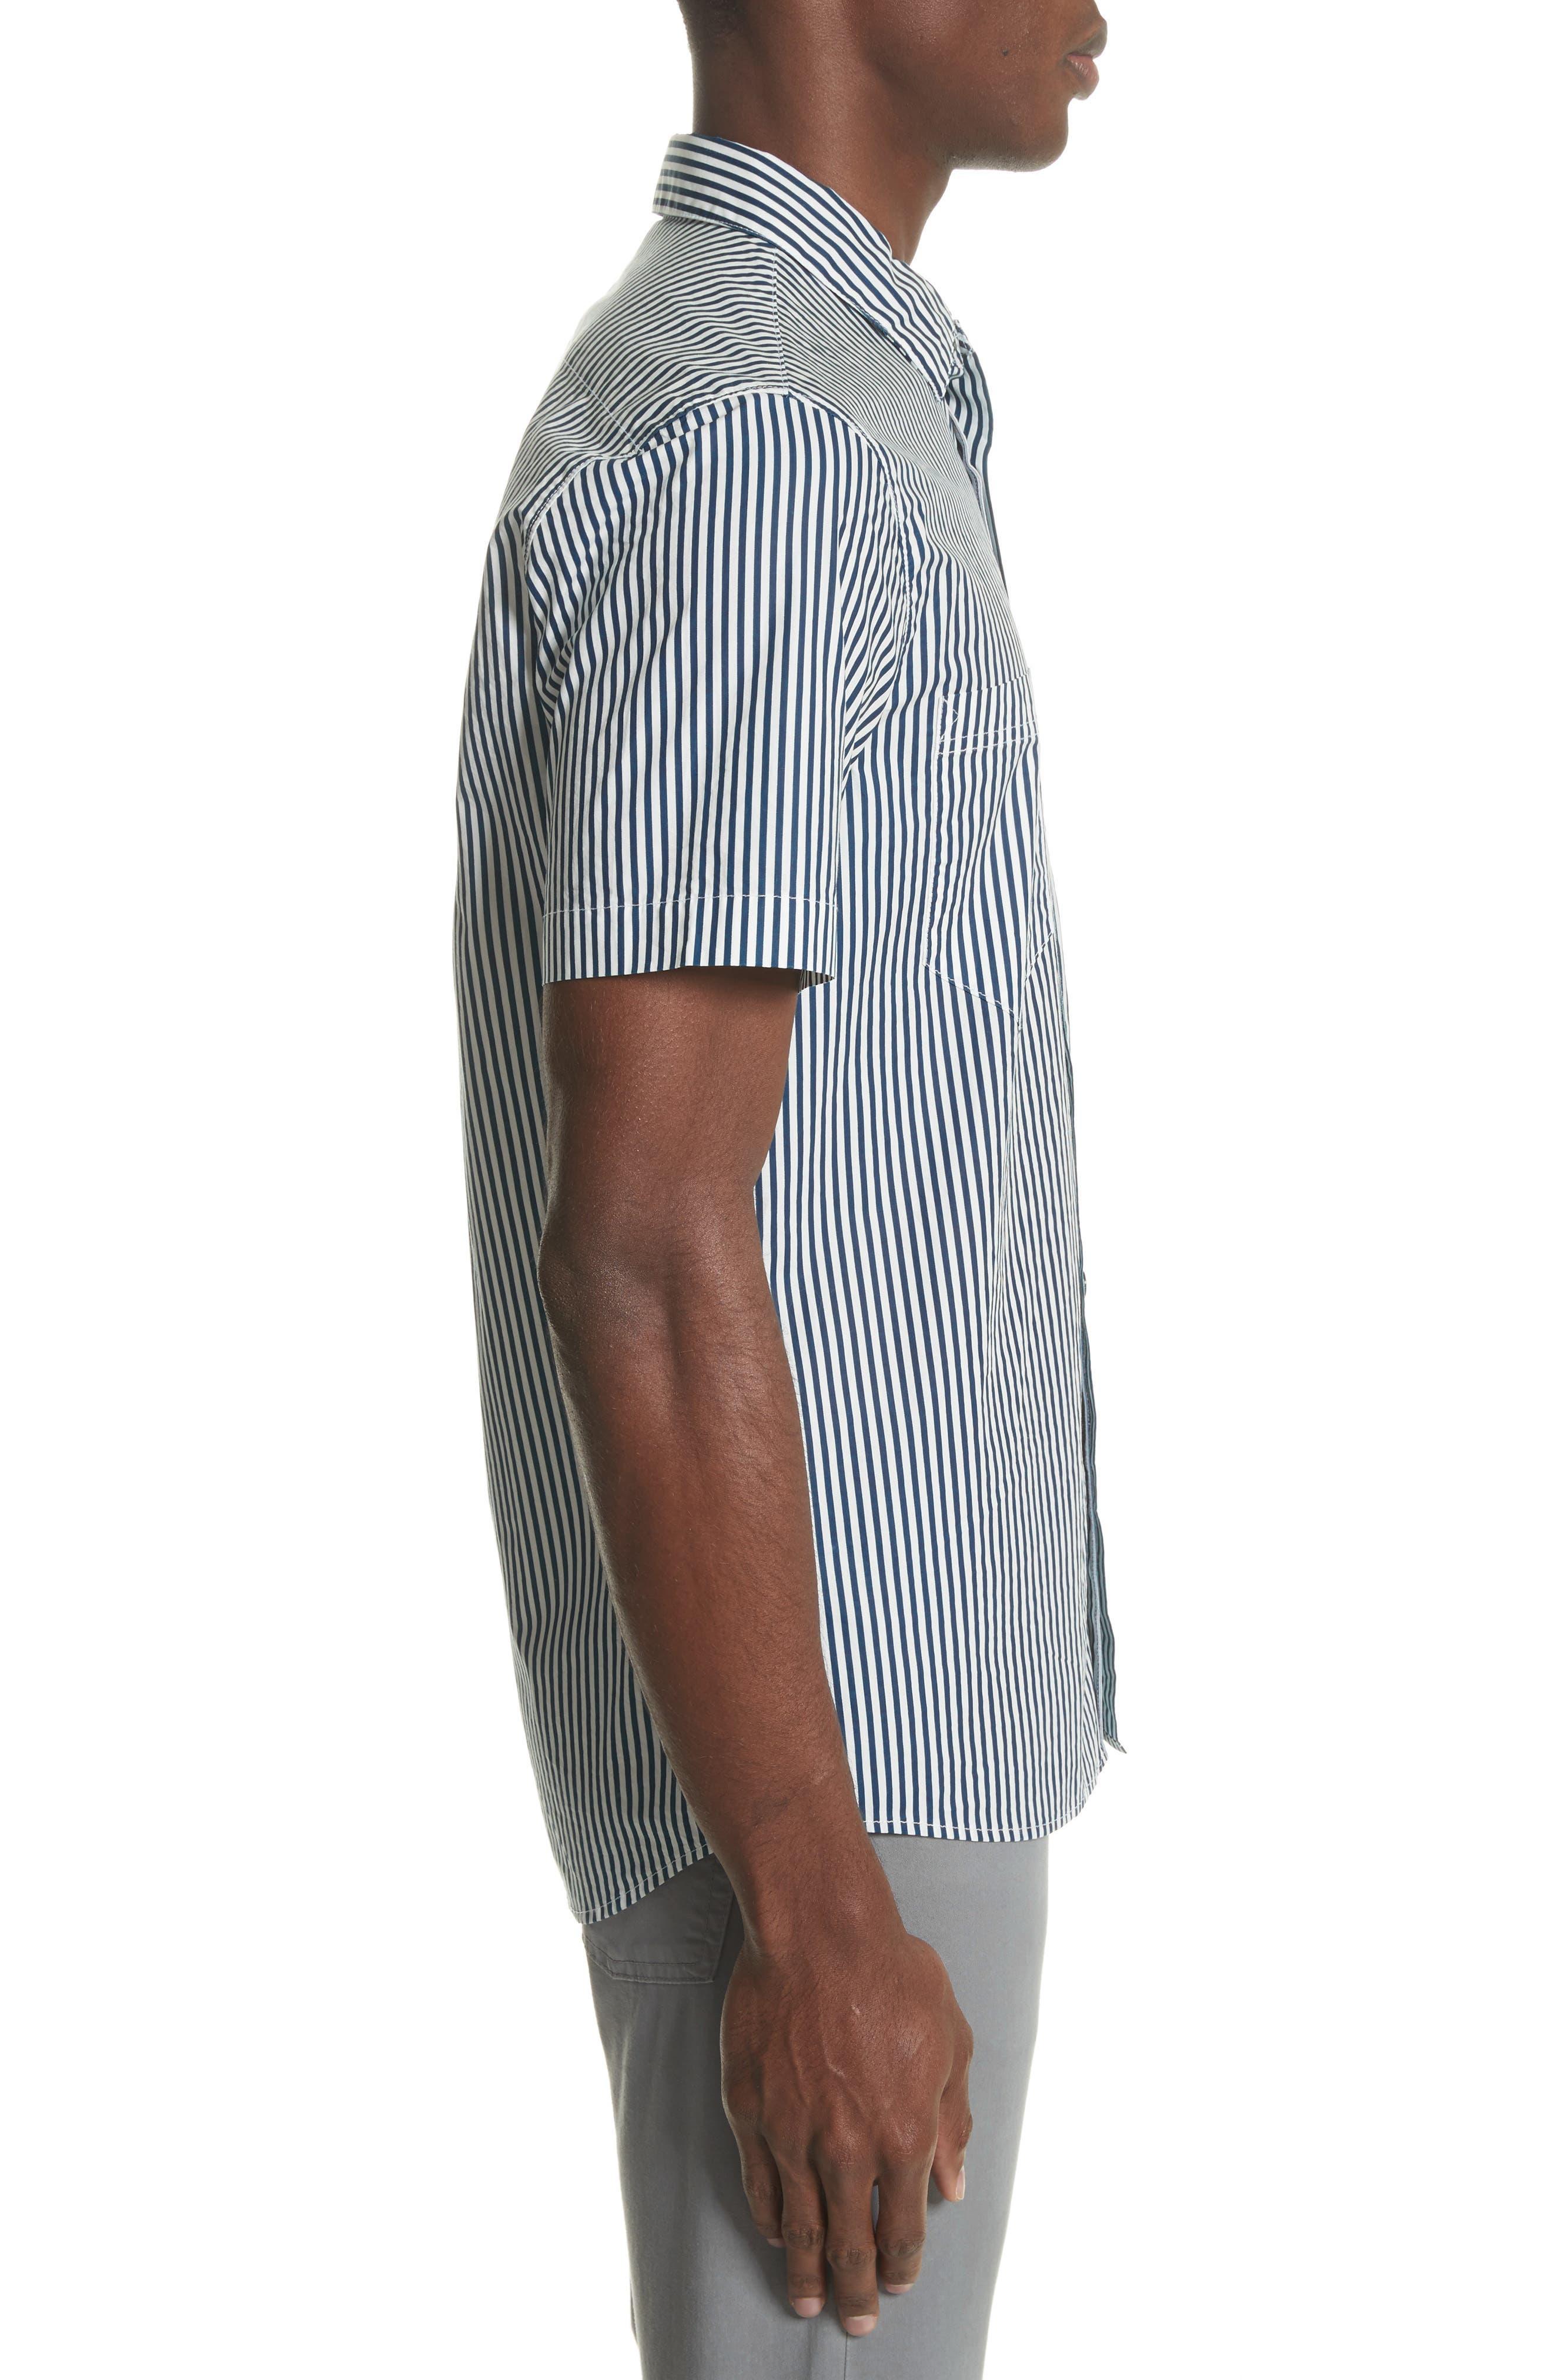 STONE ISLAND,                             Stripe Woven Shirt,                             Alternate thumbnail 3, color,                             100